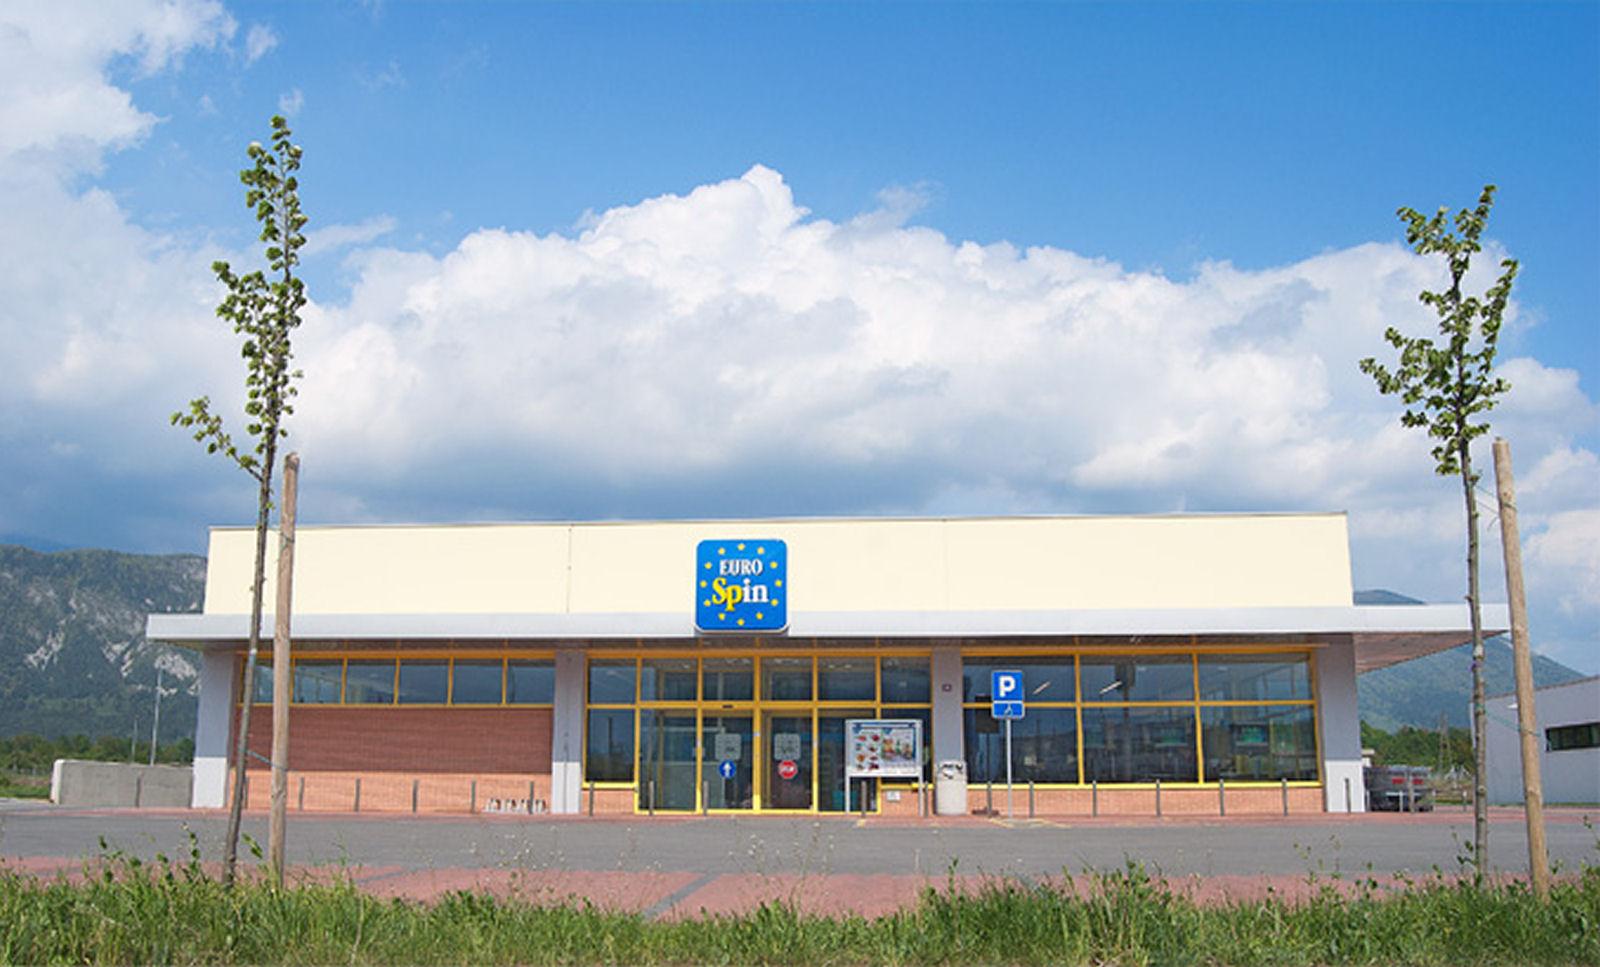 Eurospin supermarket in Lesce, Slovenia